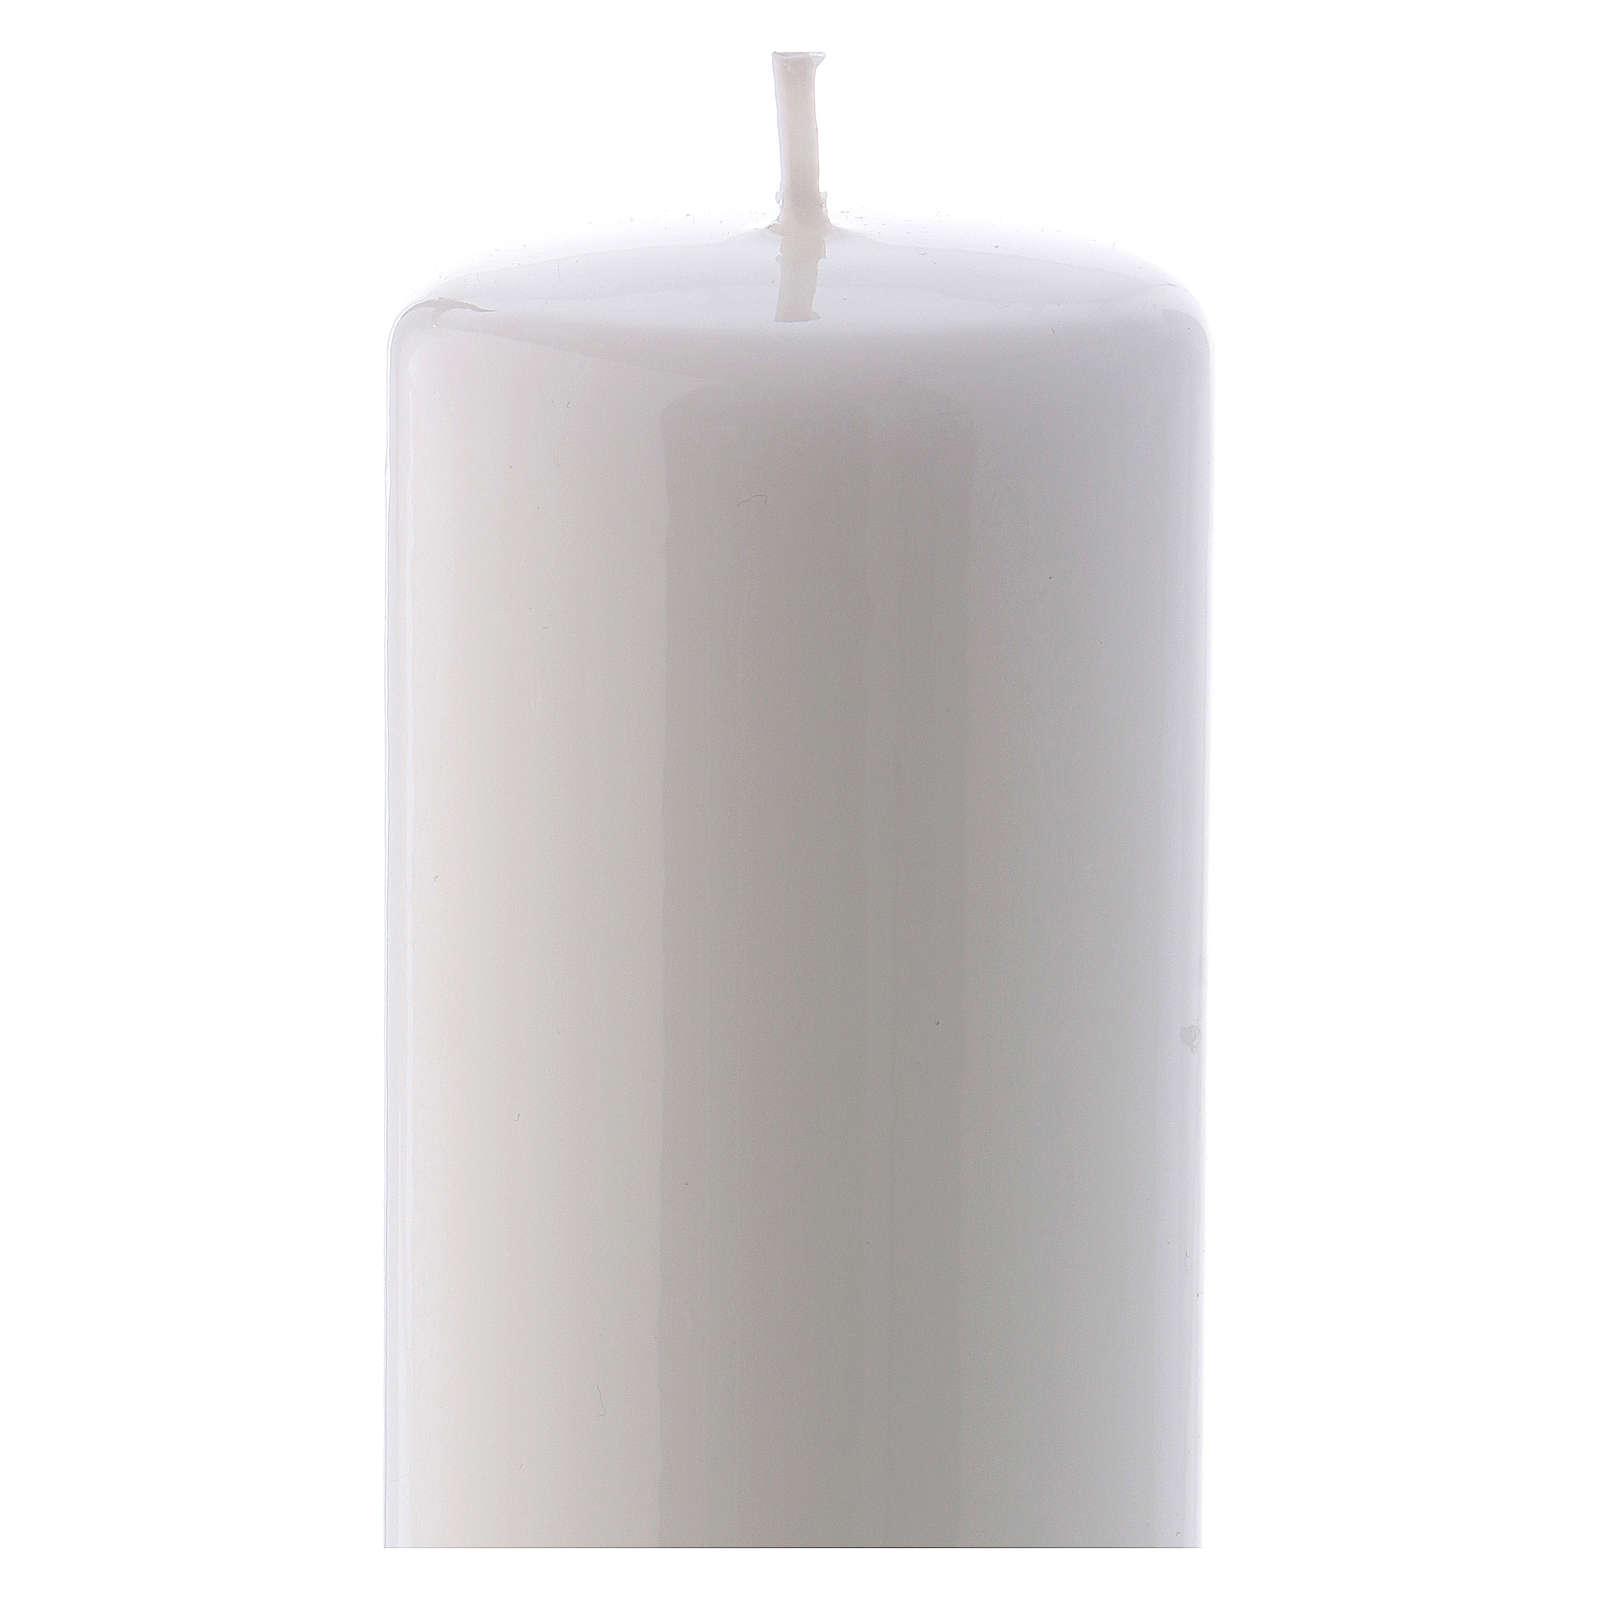 Vela blanca Lúcida Lacre 6x15 cm 3